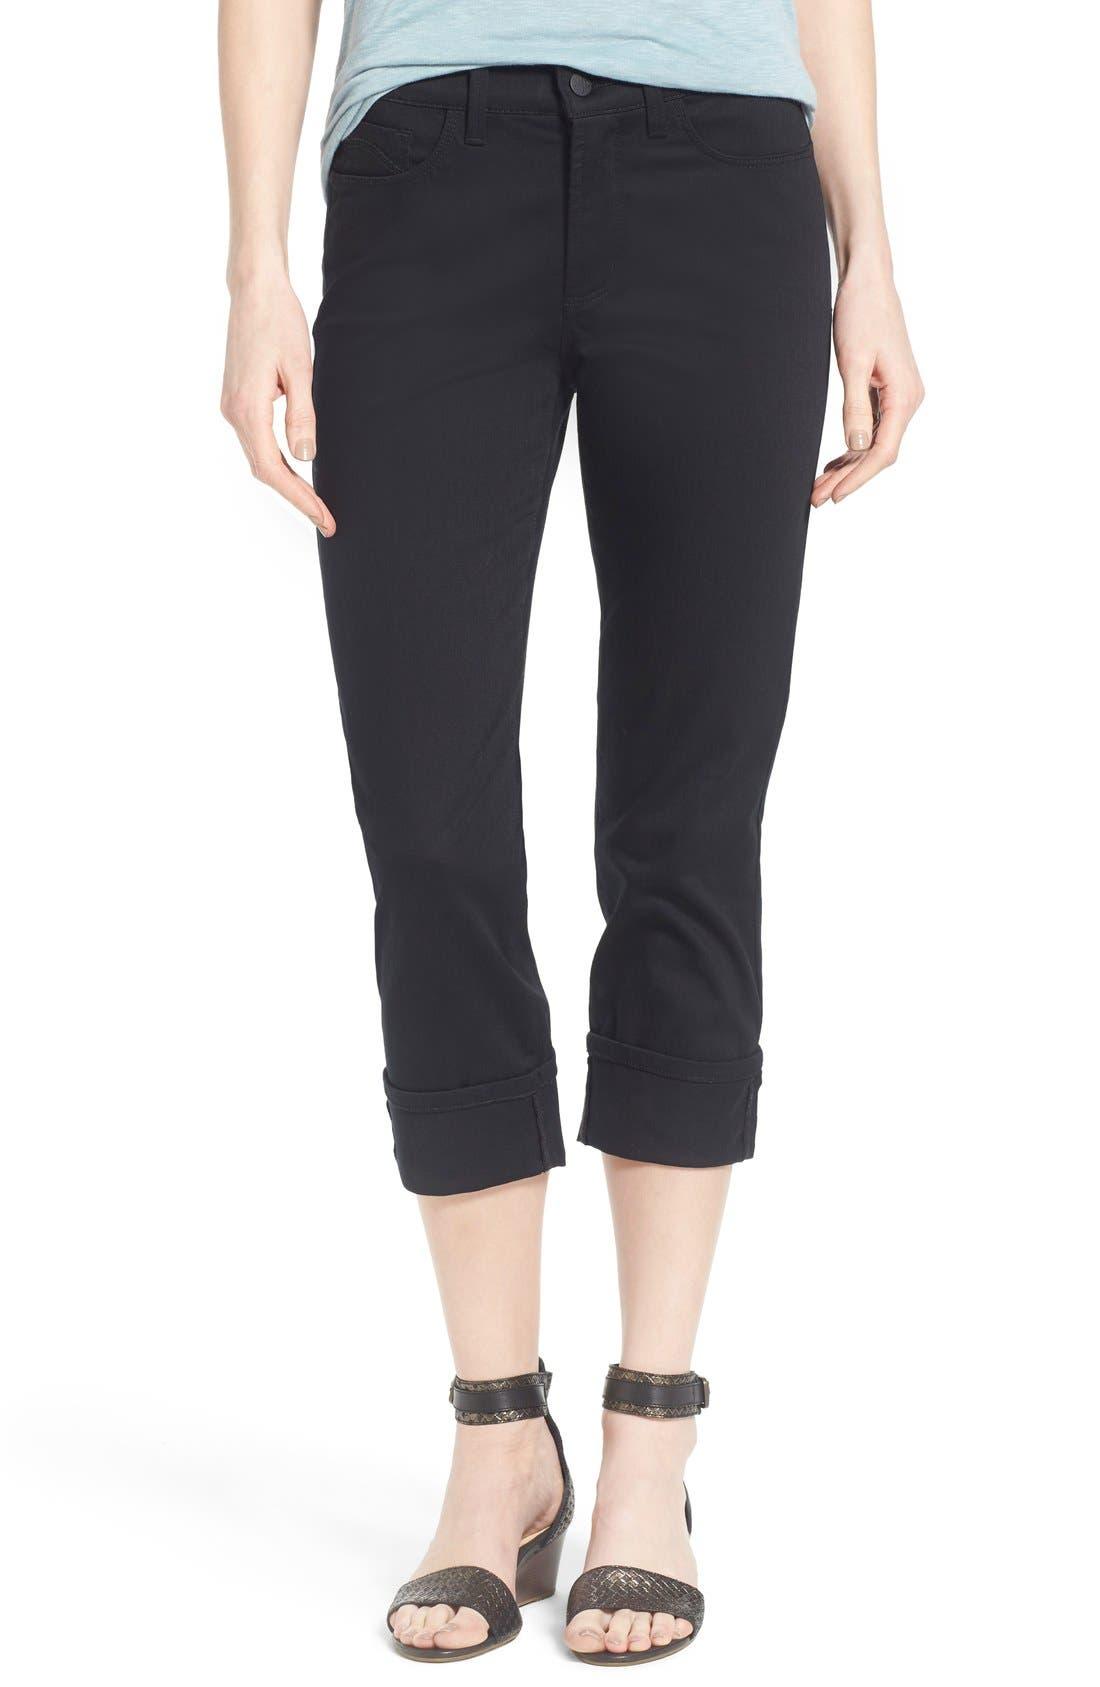 'Dayla' Colored Wide Cuff Capri Jeans,                             Main thumbnail 1, color,                             001